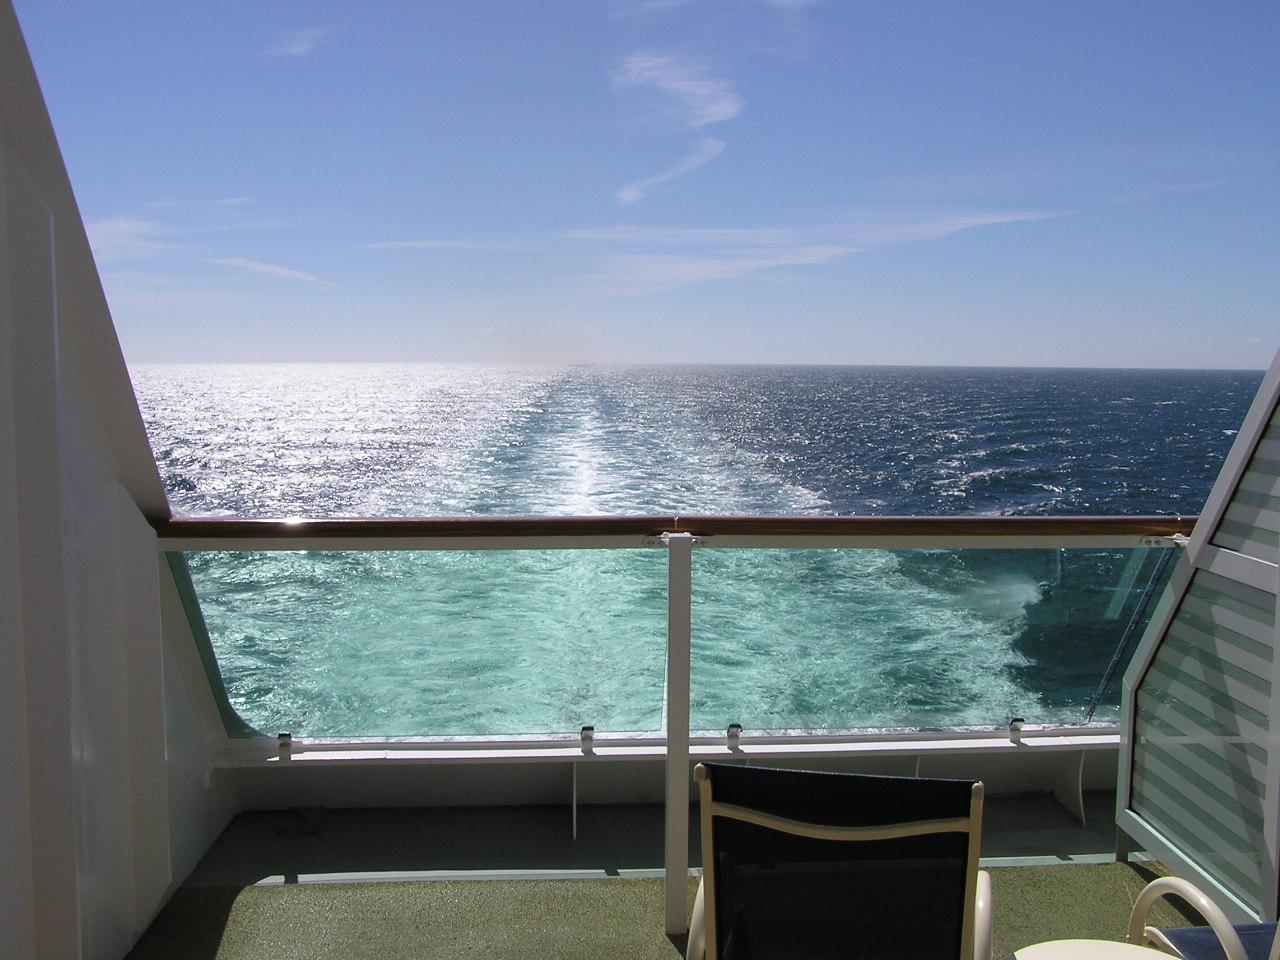 Royal Caribbean Serenade of the Seas 1604